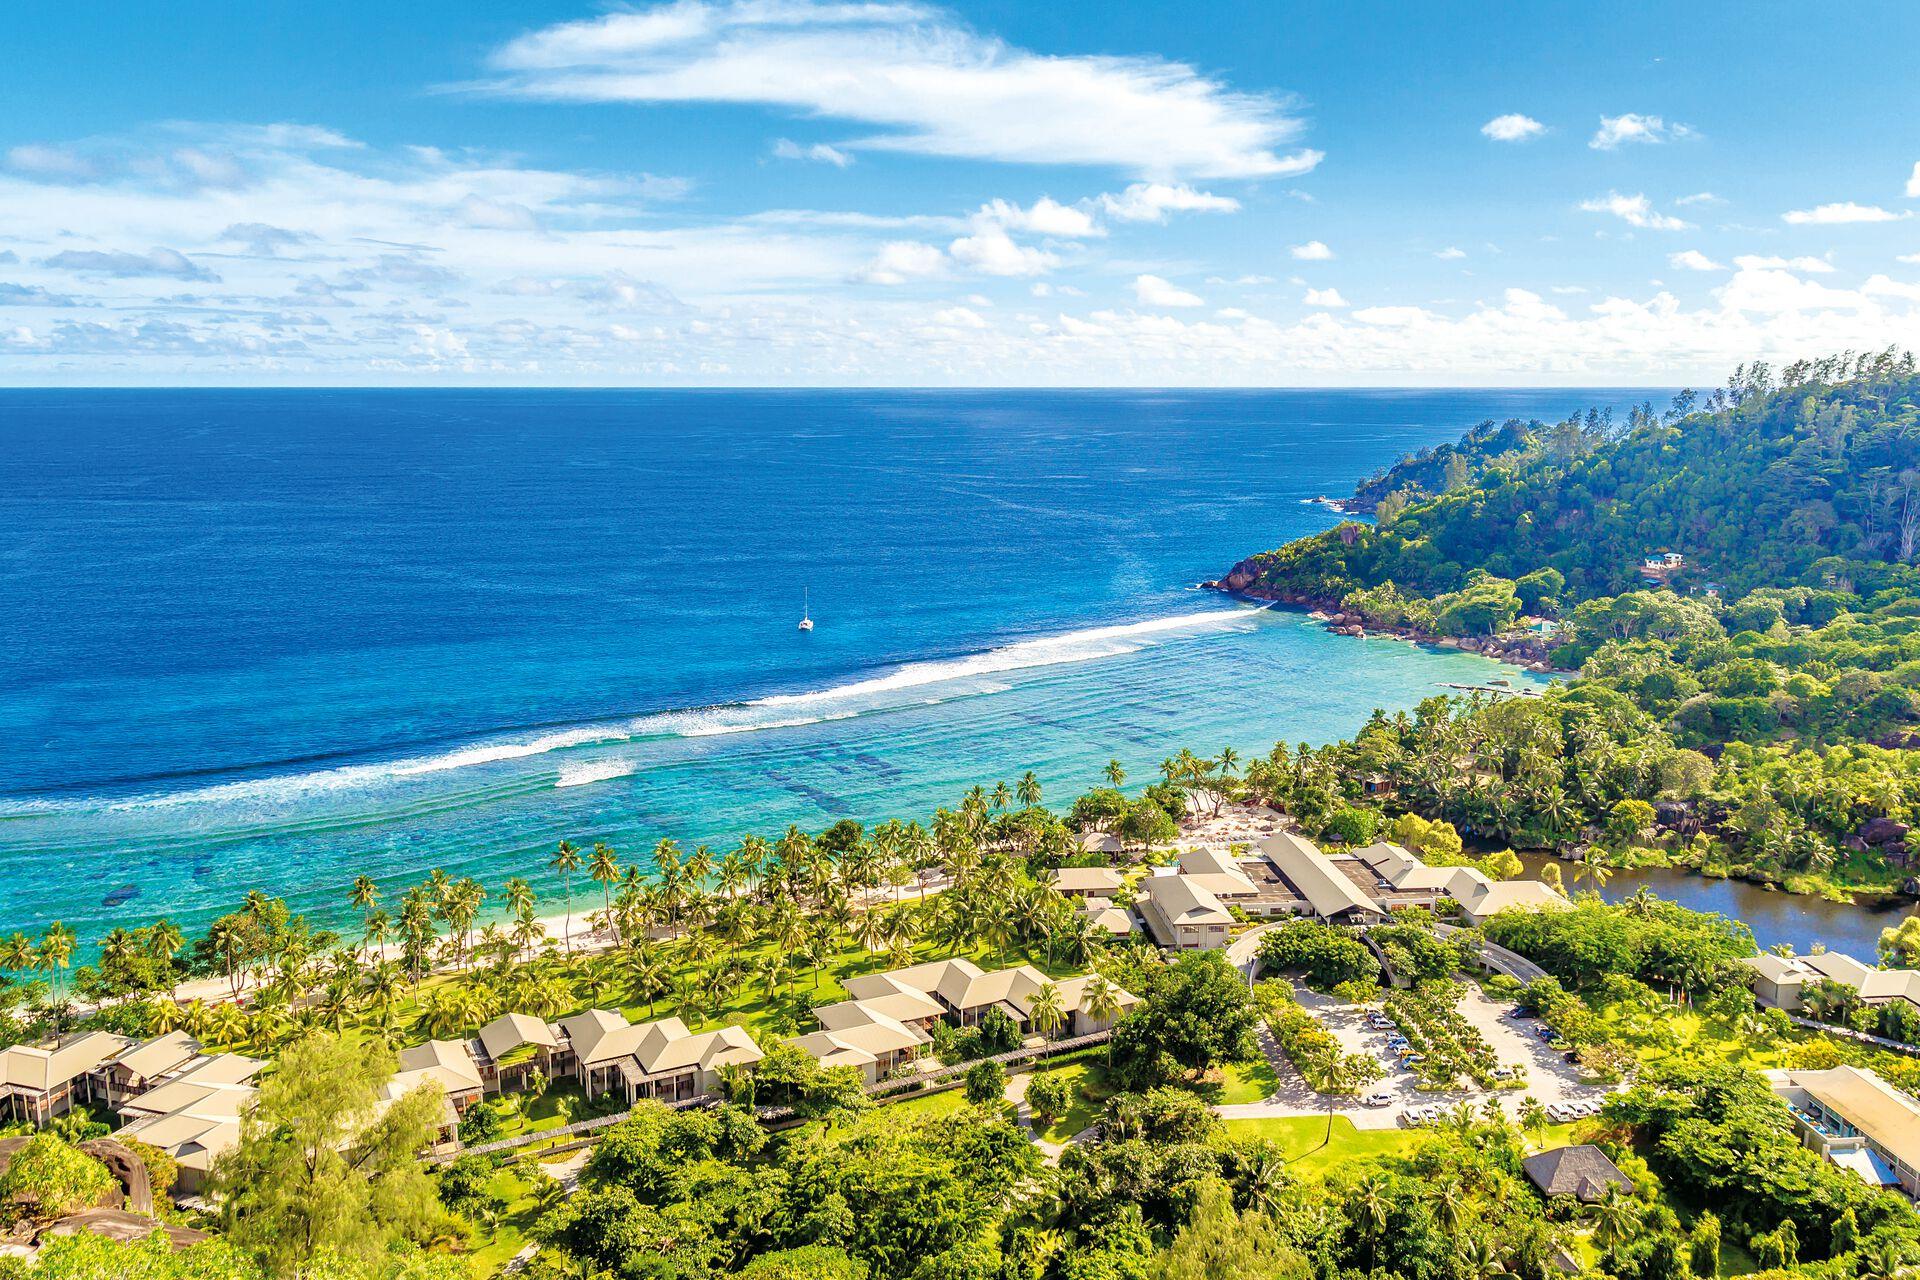 Kempinski Seychelles Resort Baie Lazare - 5*